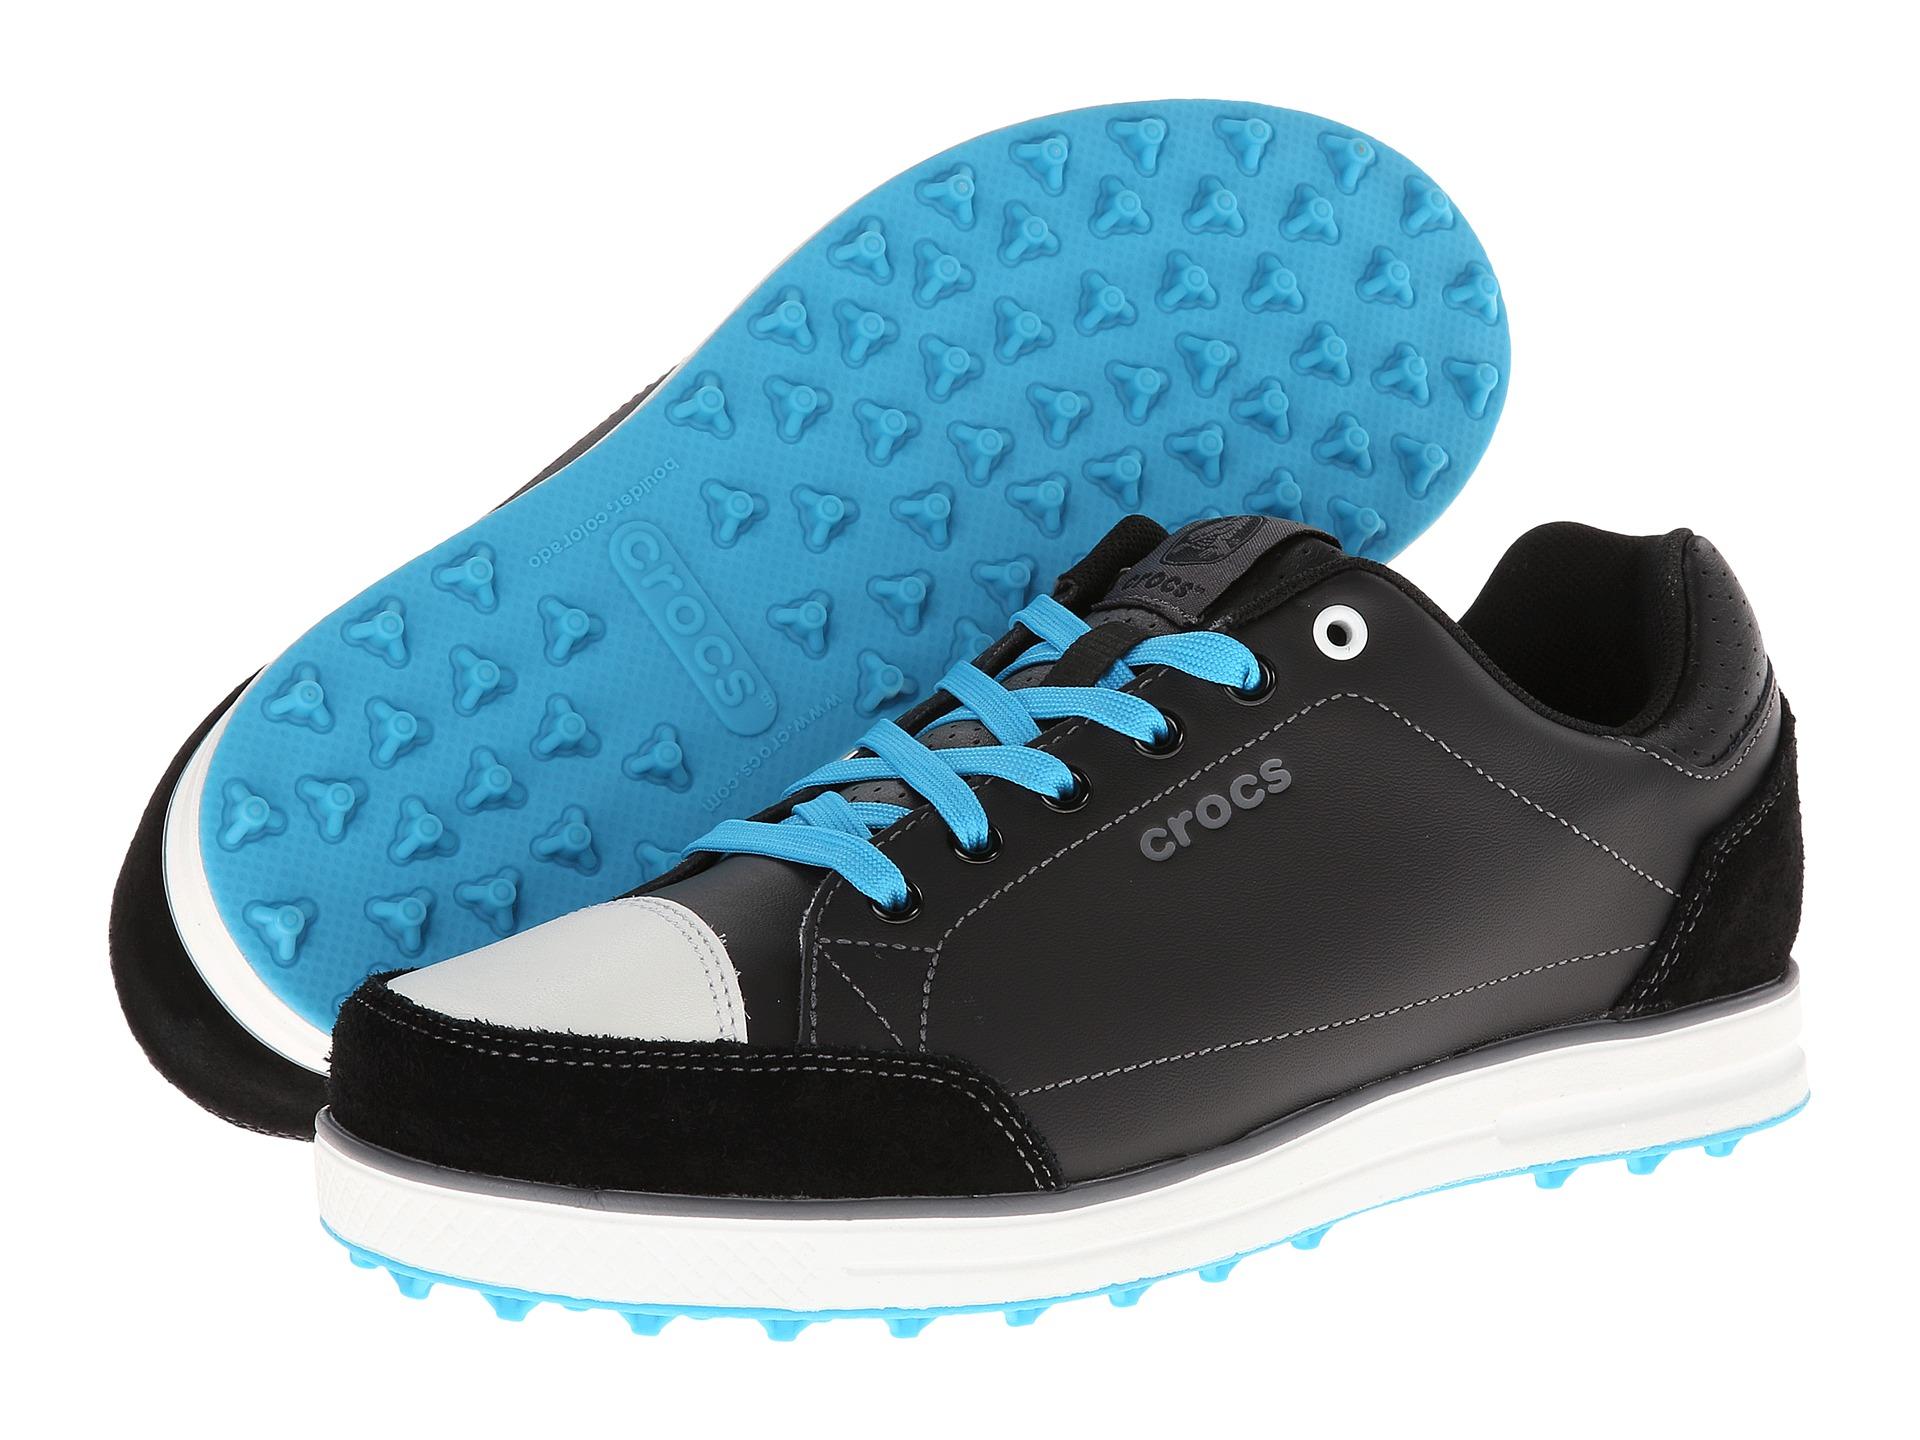 crocs karlson golf shoe m shoes shipped free at zappos